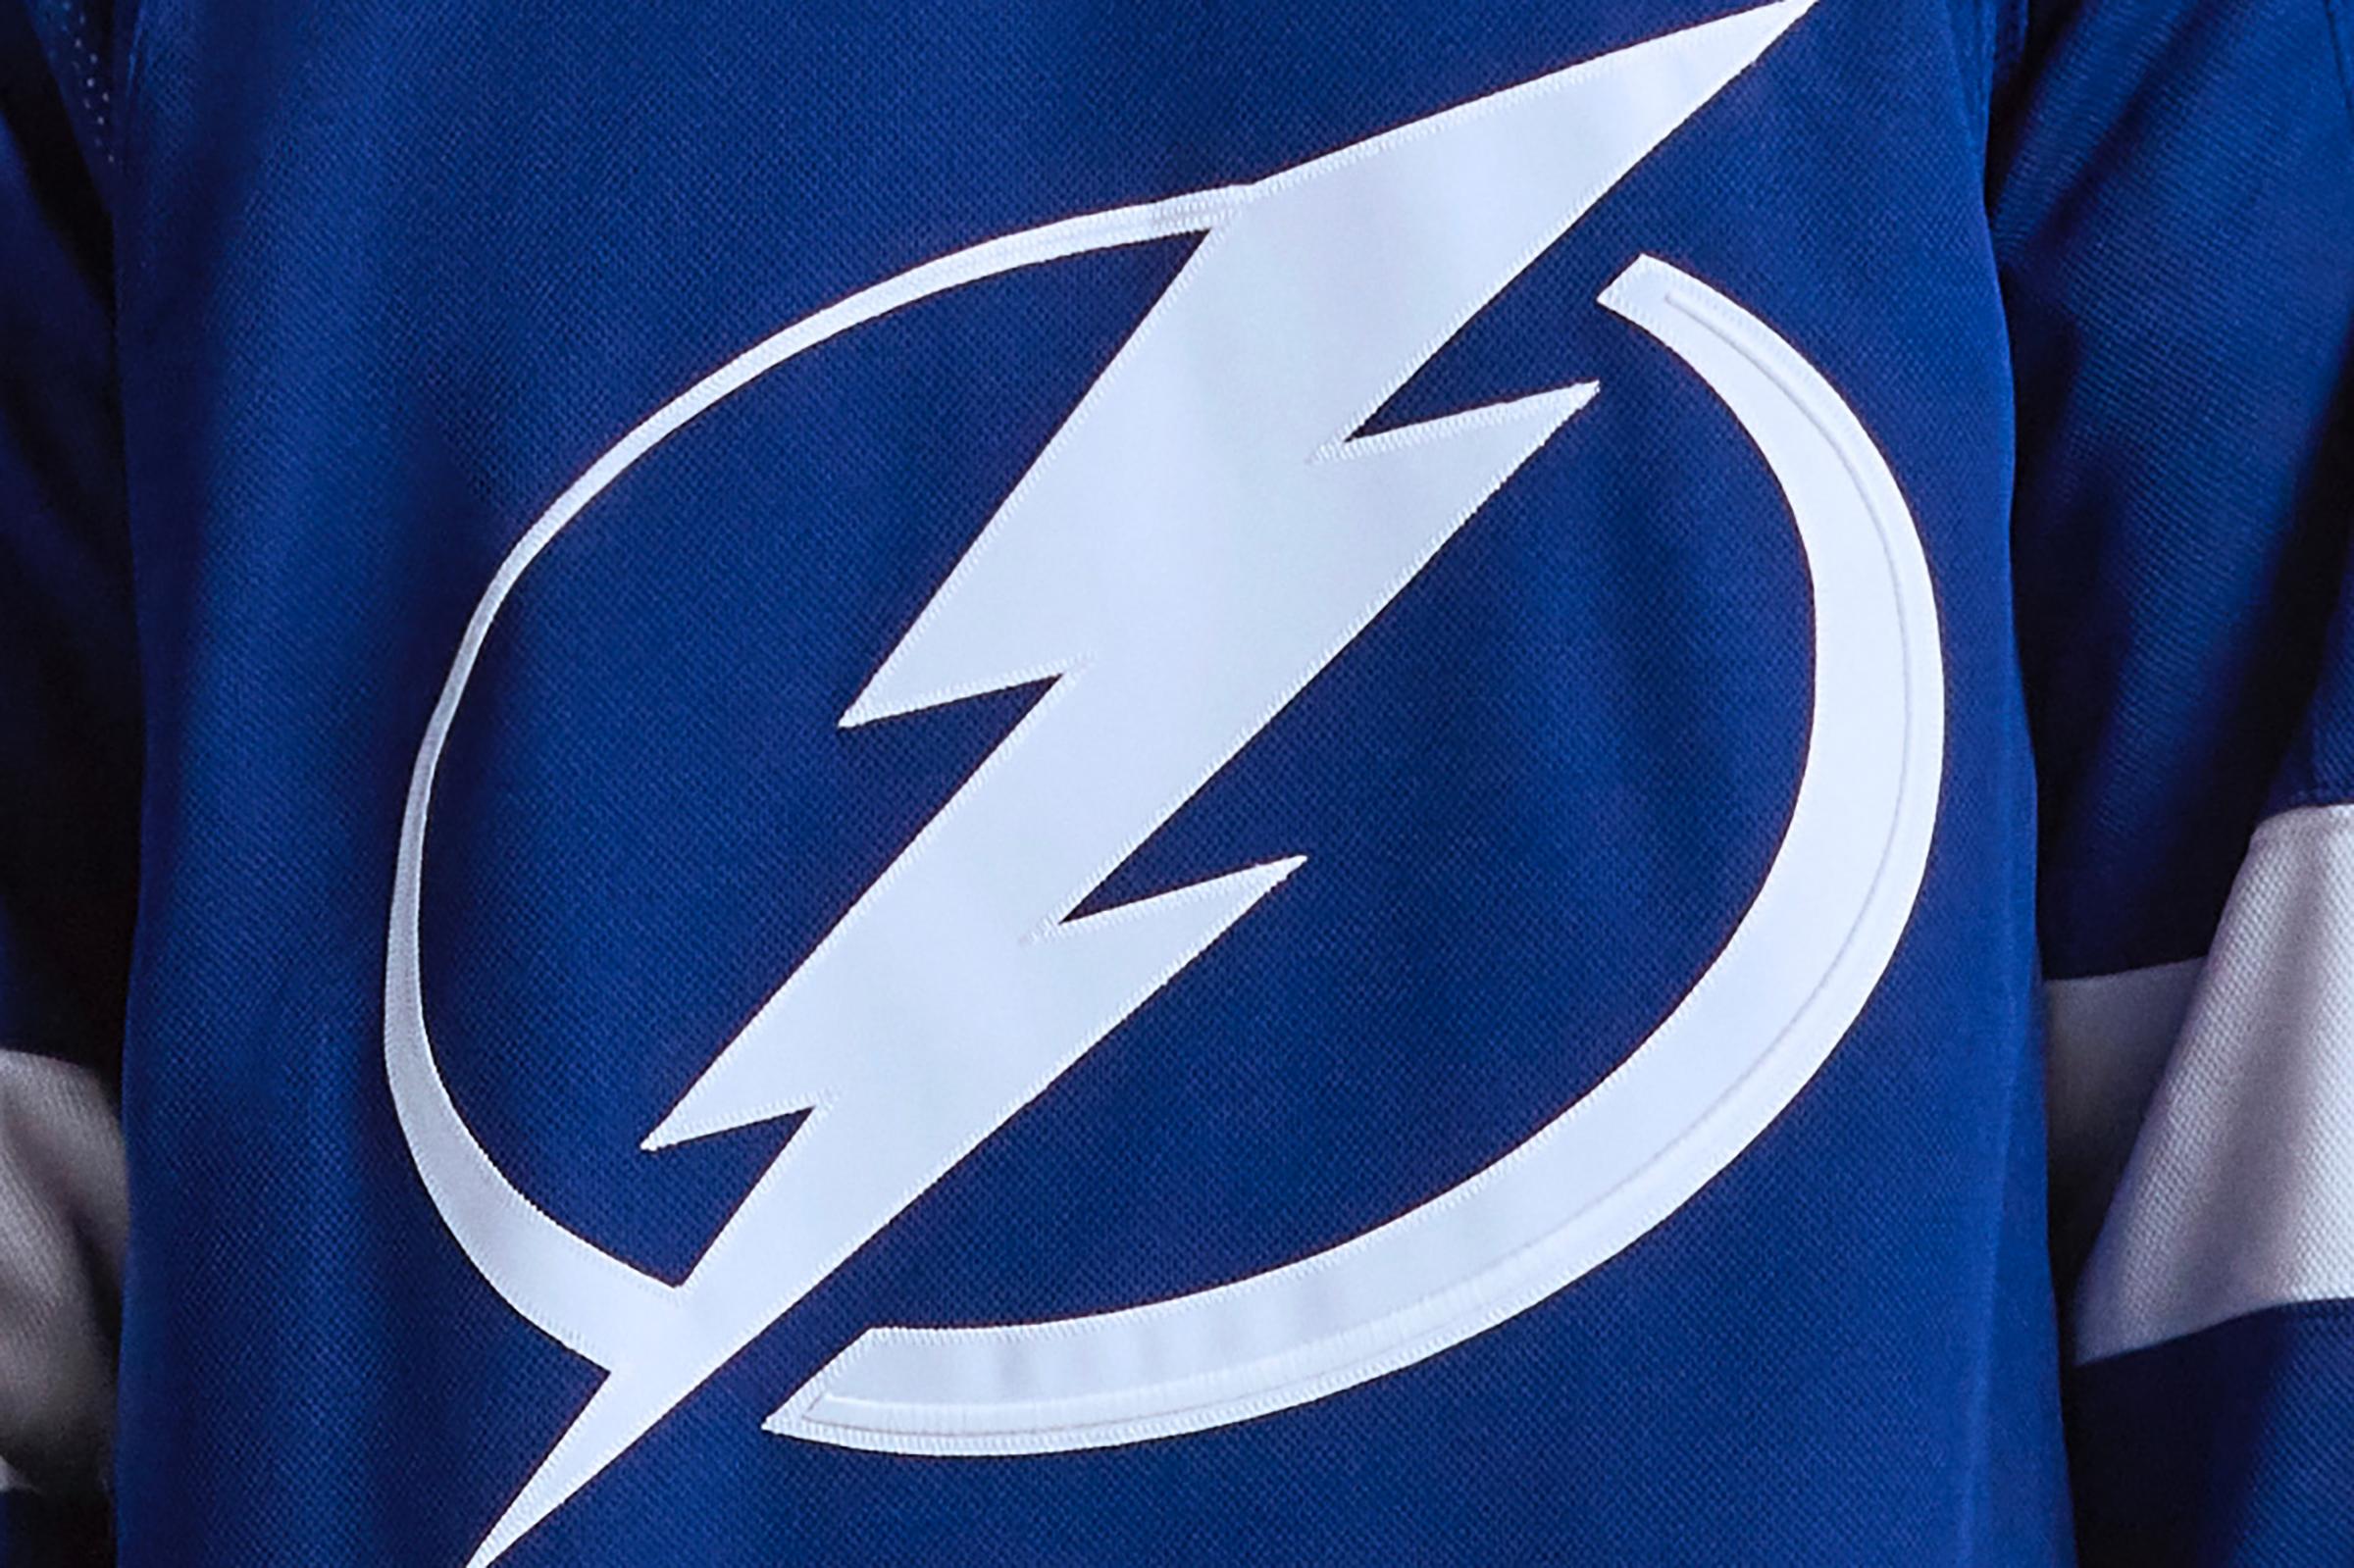 Lightning's new uniform.